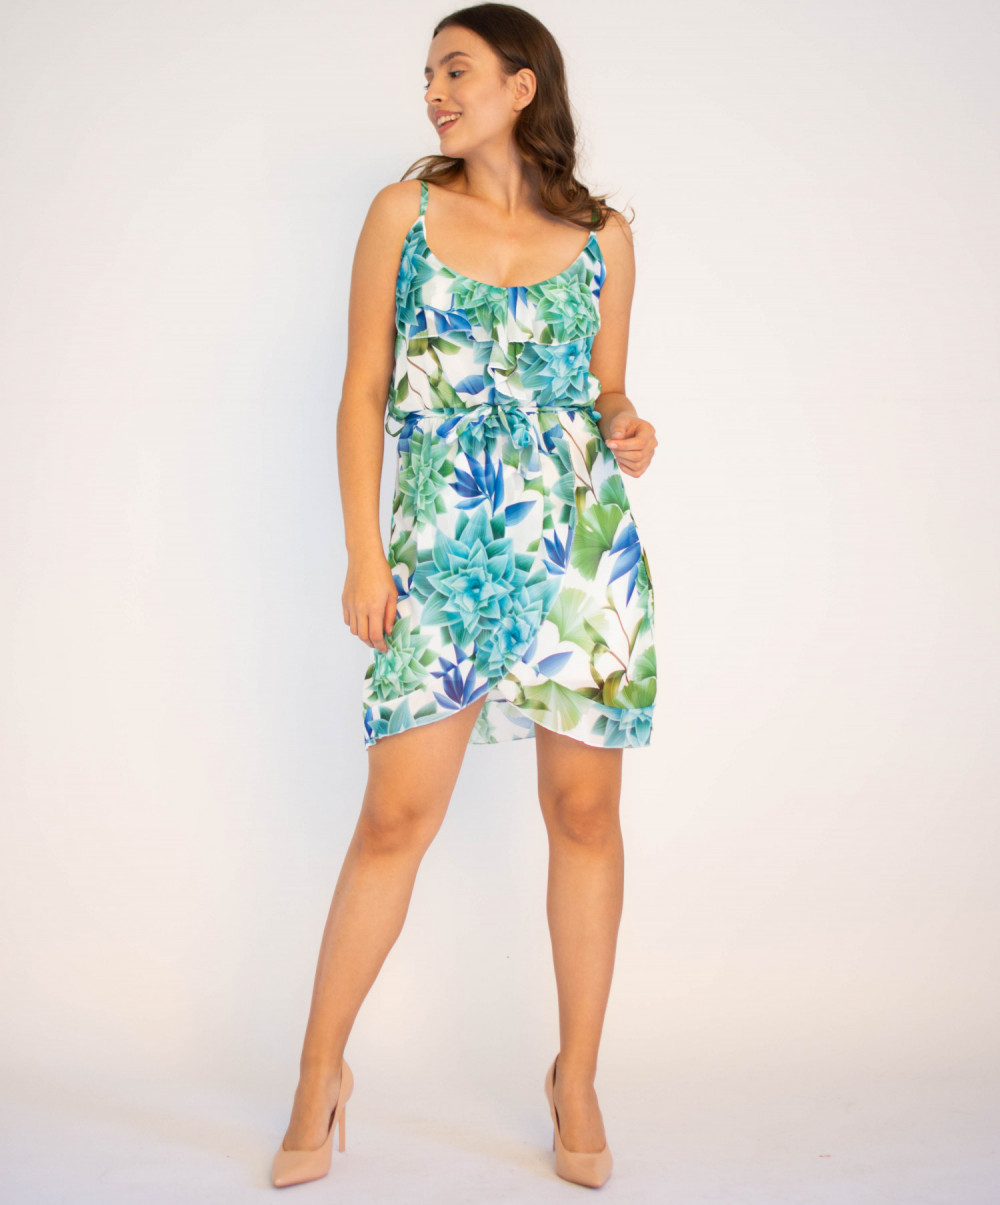 Sukienka kwiatowa na ramiączkach Chrisitina 4